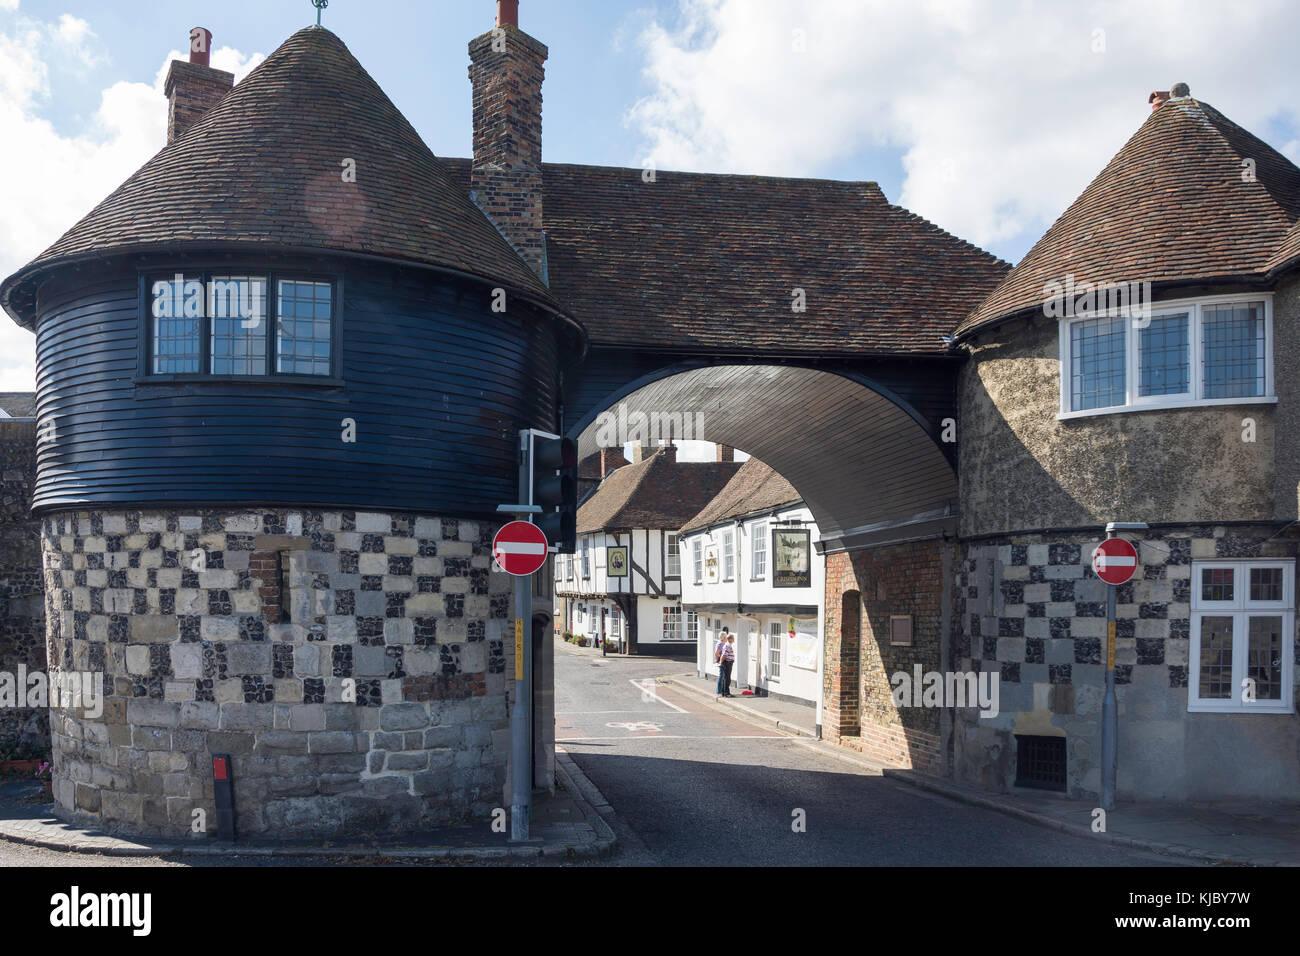 14th century The Barbican, High Street, Sandwich, Kent, England, United Kingdom - Stock Image